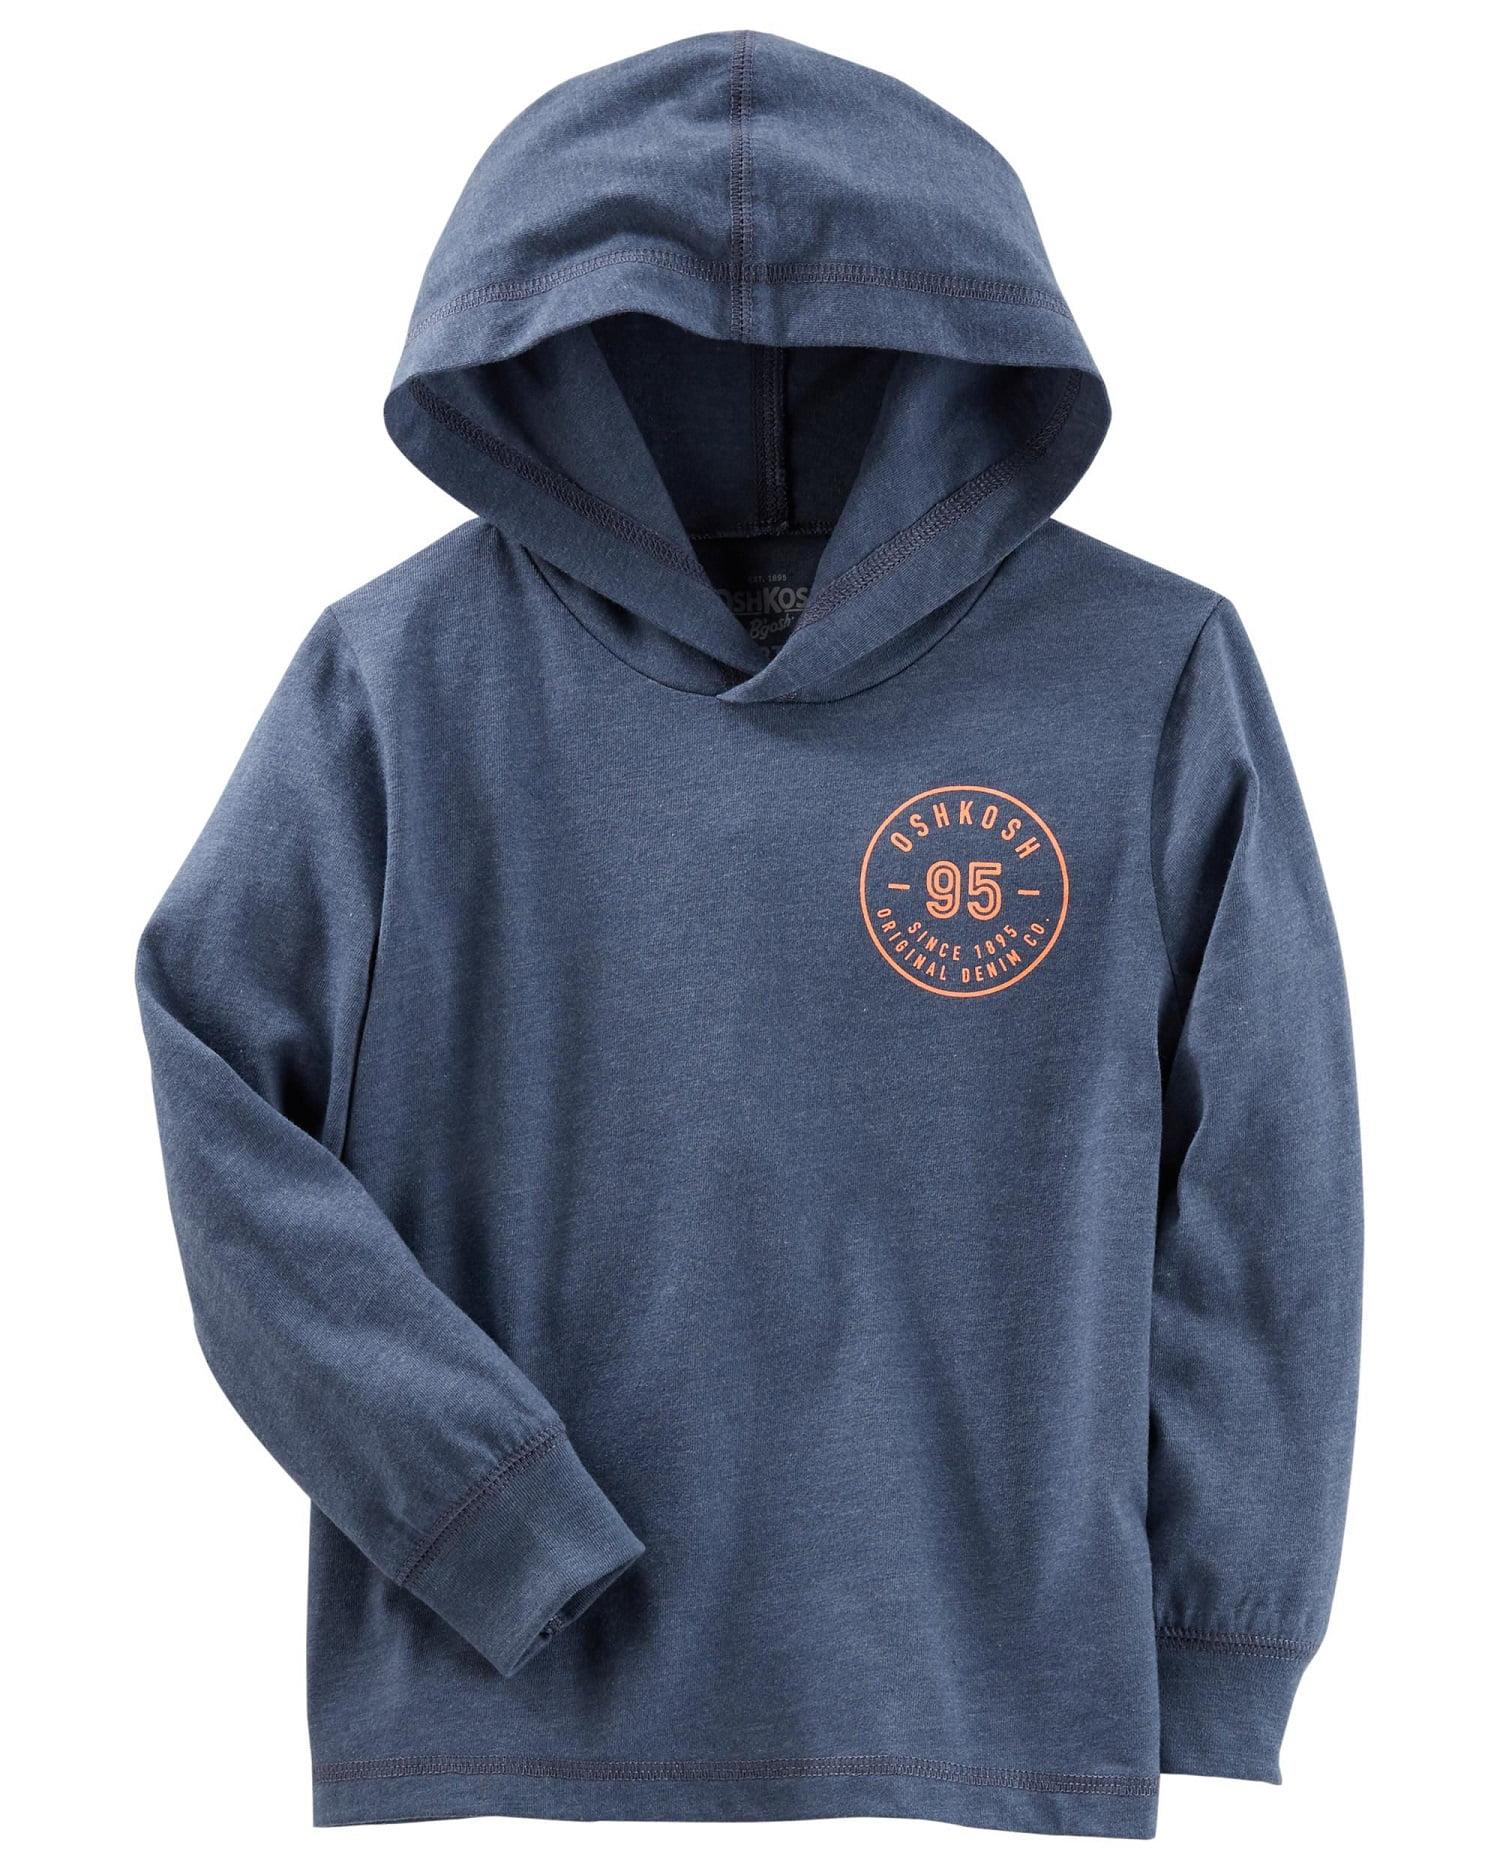 OshKosh B'gosh Little Boys' Logo Pullover, Blue, 4-5 Kids